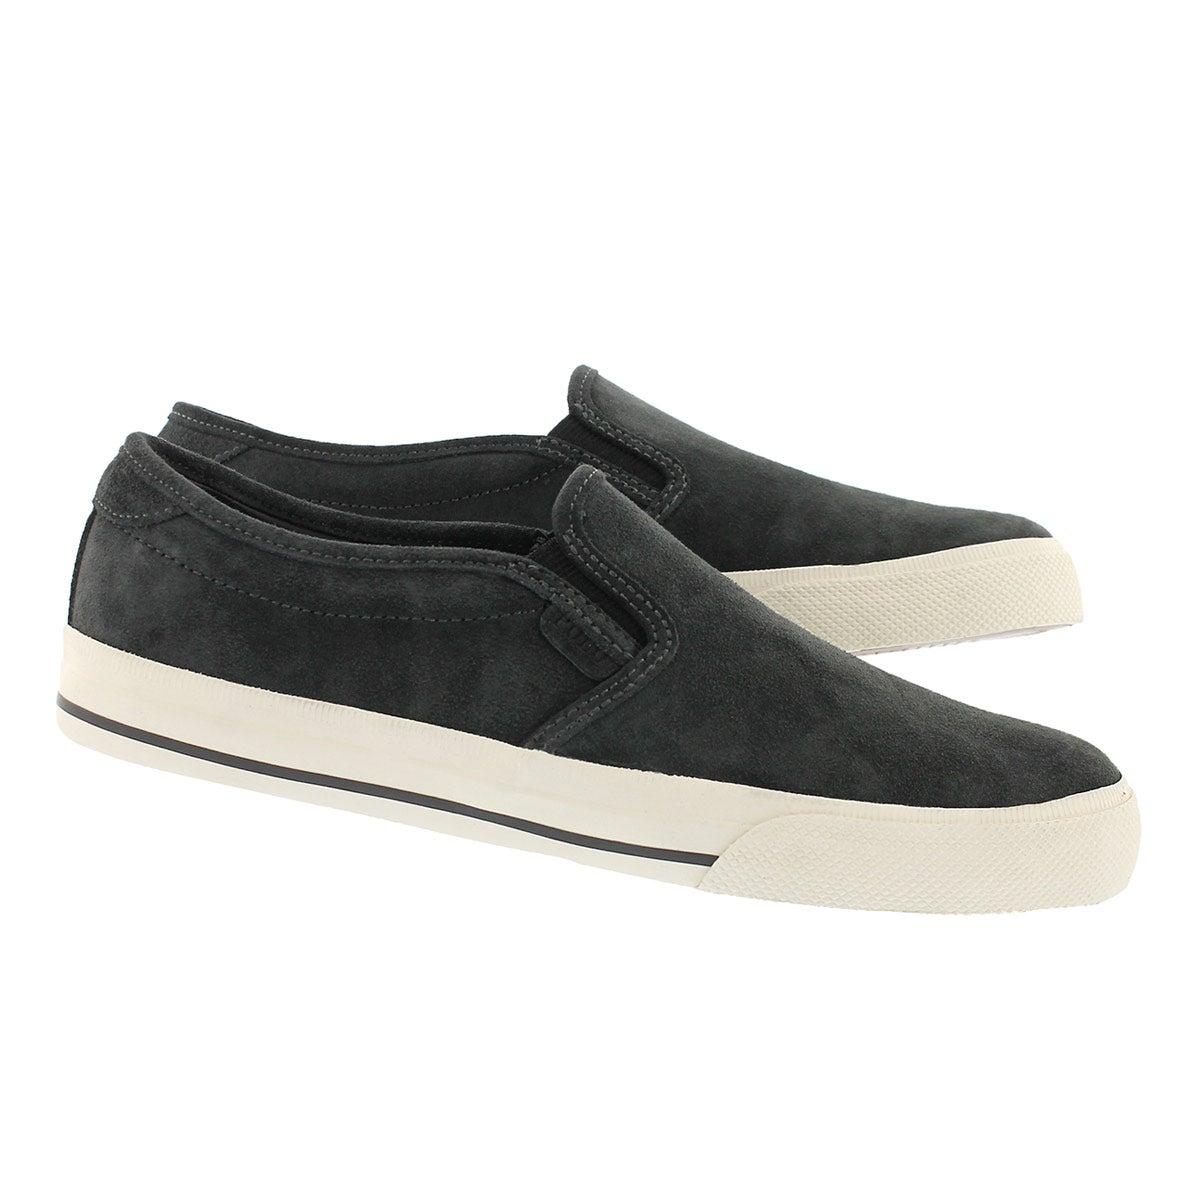 Mns Vaughn Slip On II grey casual shoe